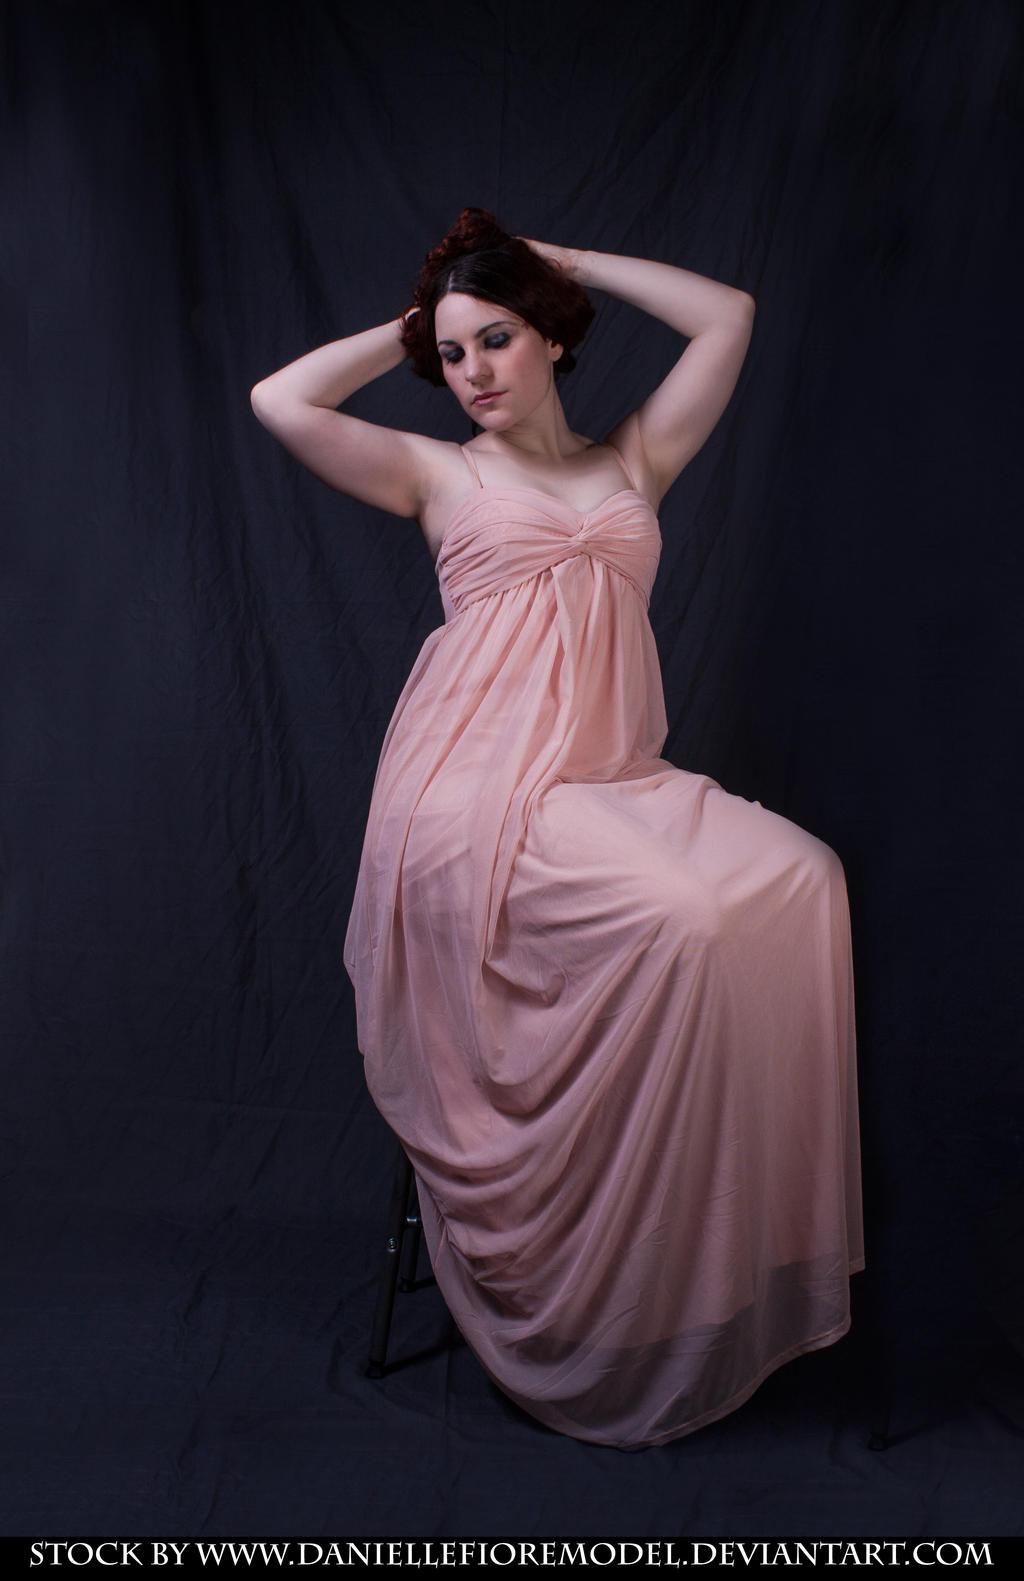 Venus Stock 6 by DanielleFioreModel